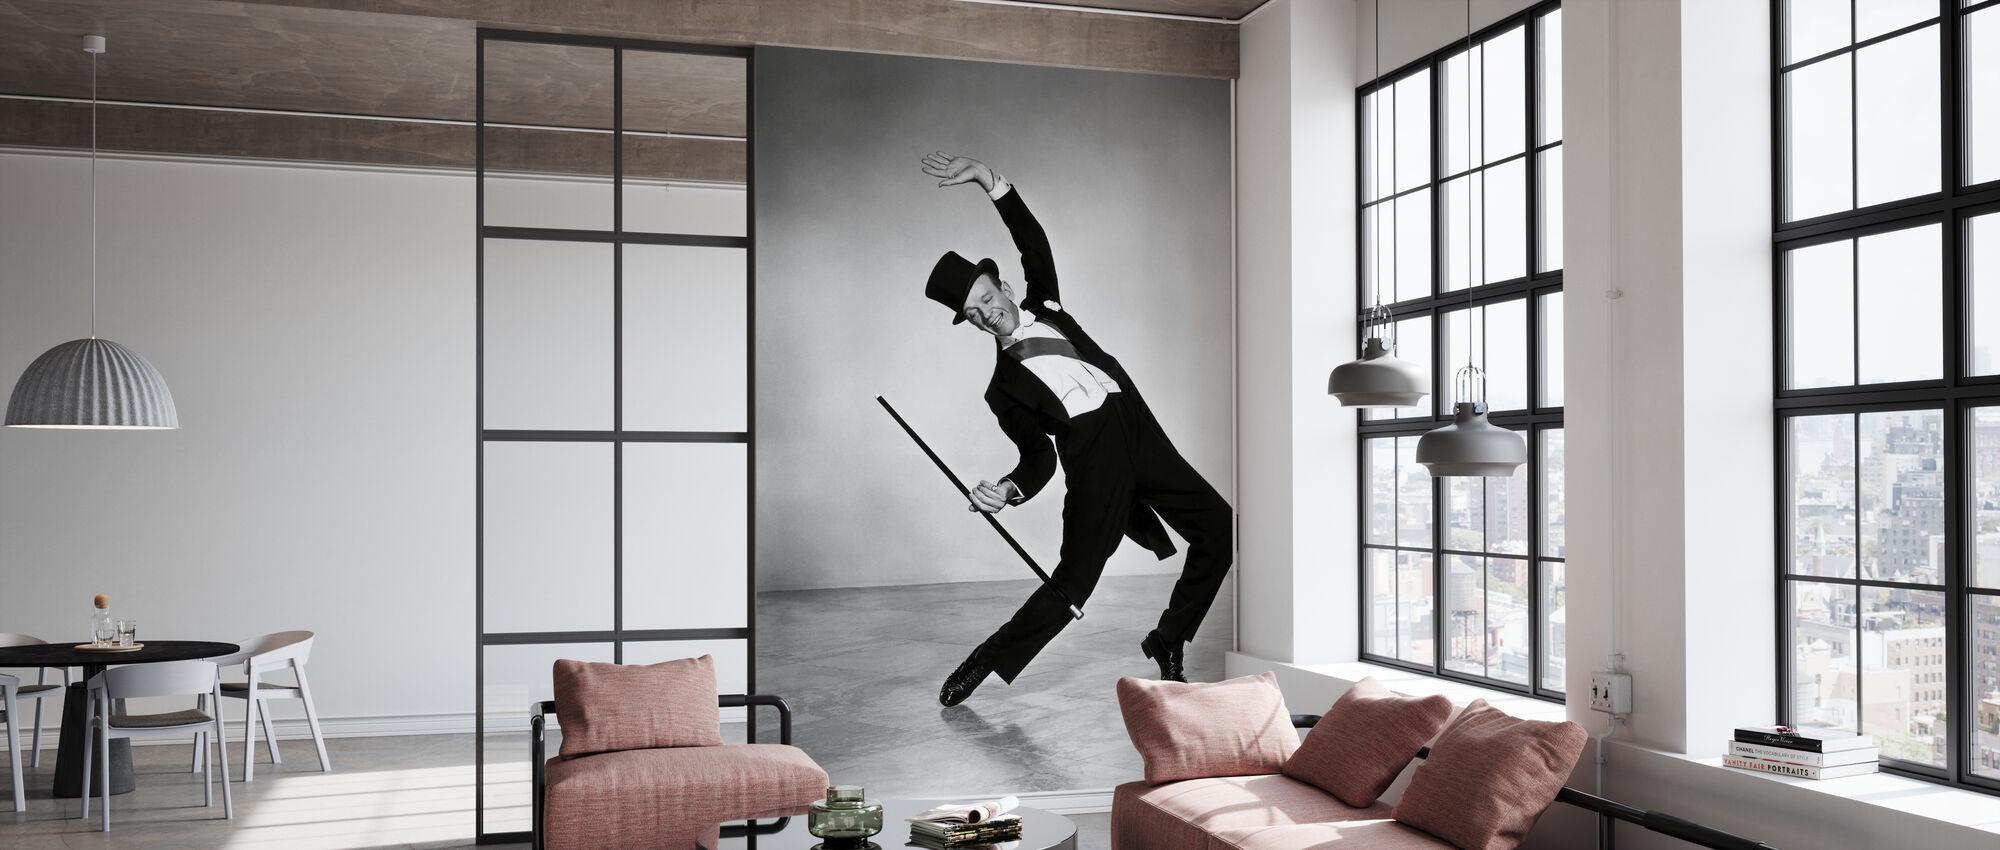 Fred Astaire - Tapetti - Toimisto